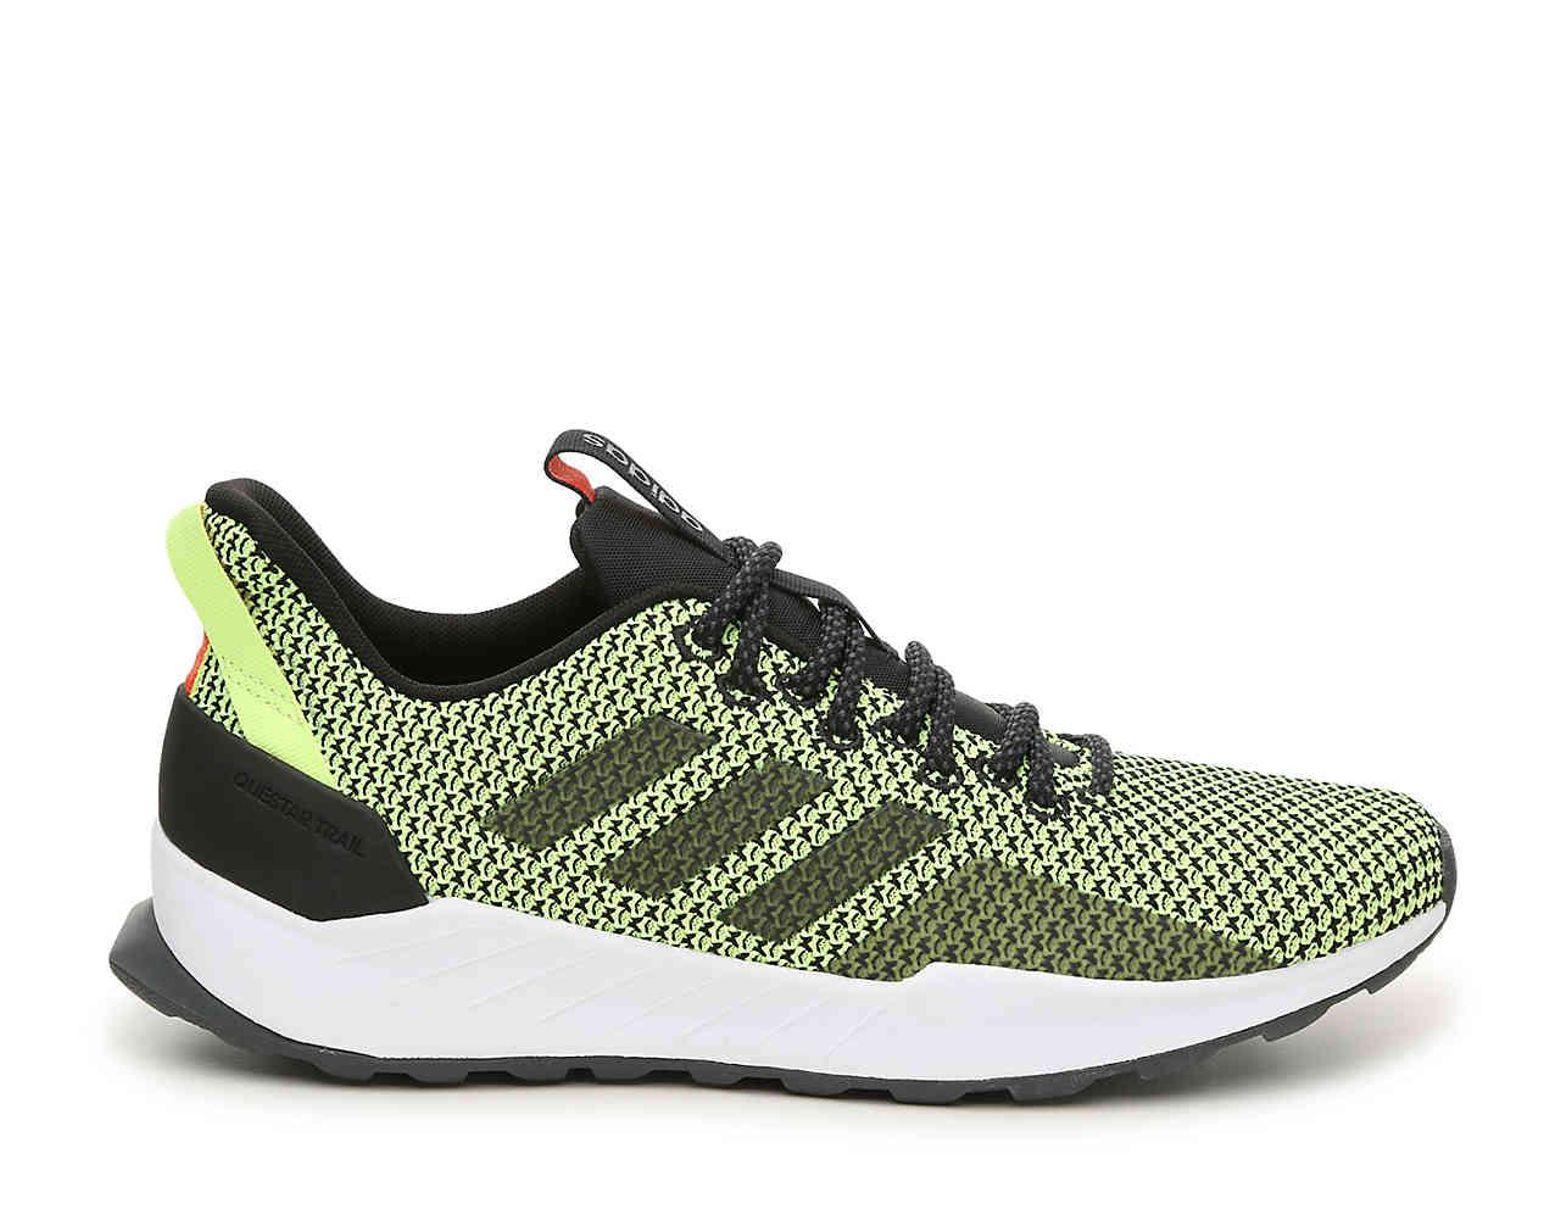 55aeb54ed84 Men's Green Questar Trail Running Shoe